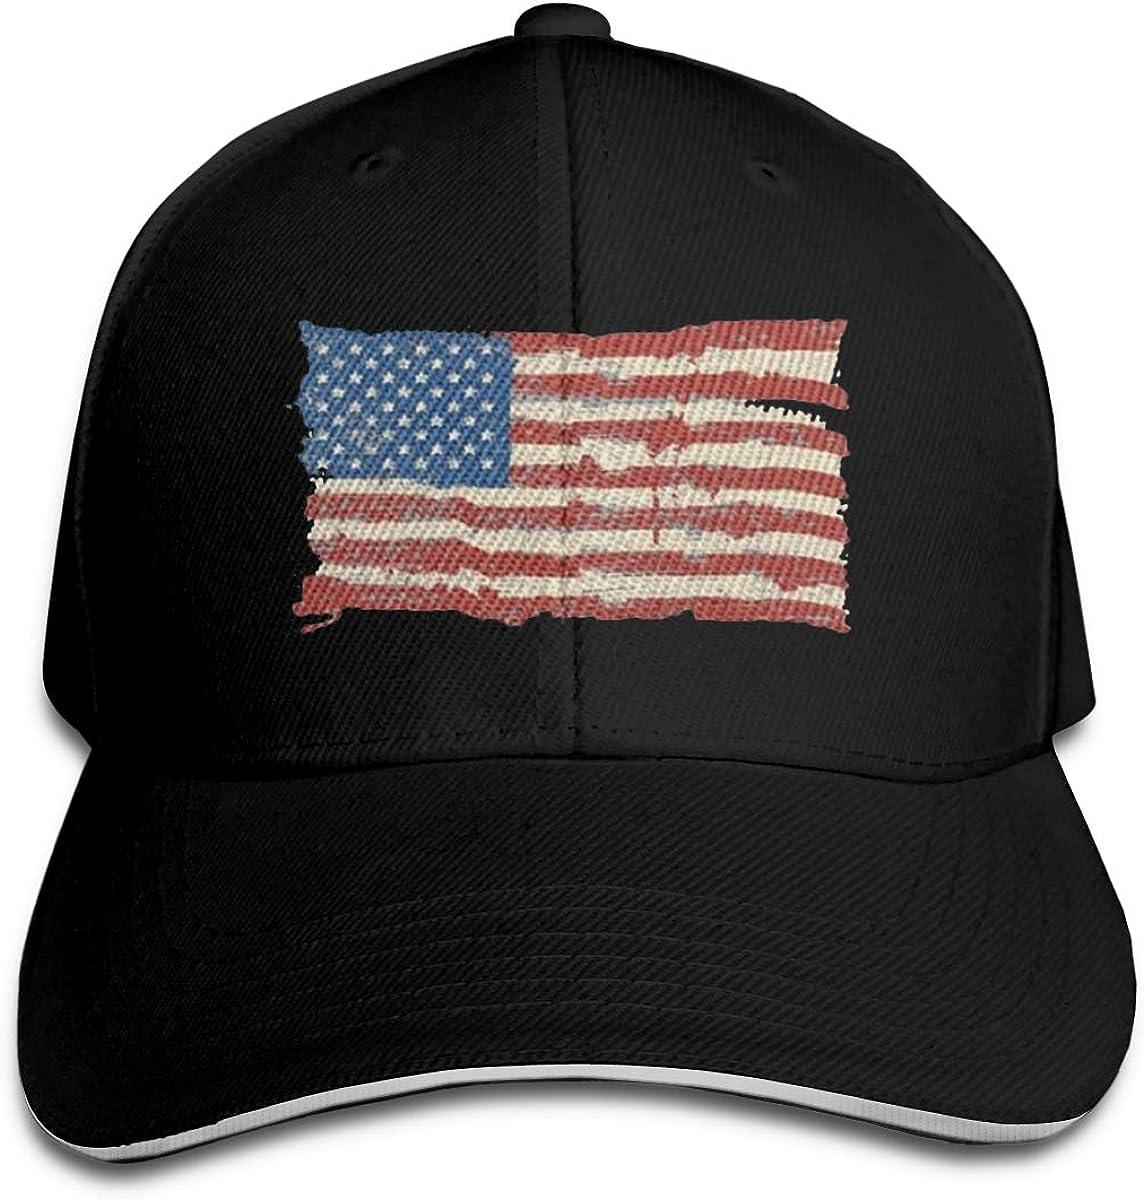 American Flag Classic Adjustable Cotton Baseball Caps Trucker Driver Hat Outdoor Cap Black